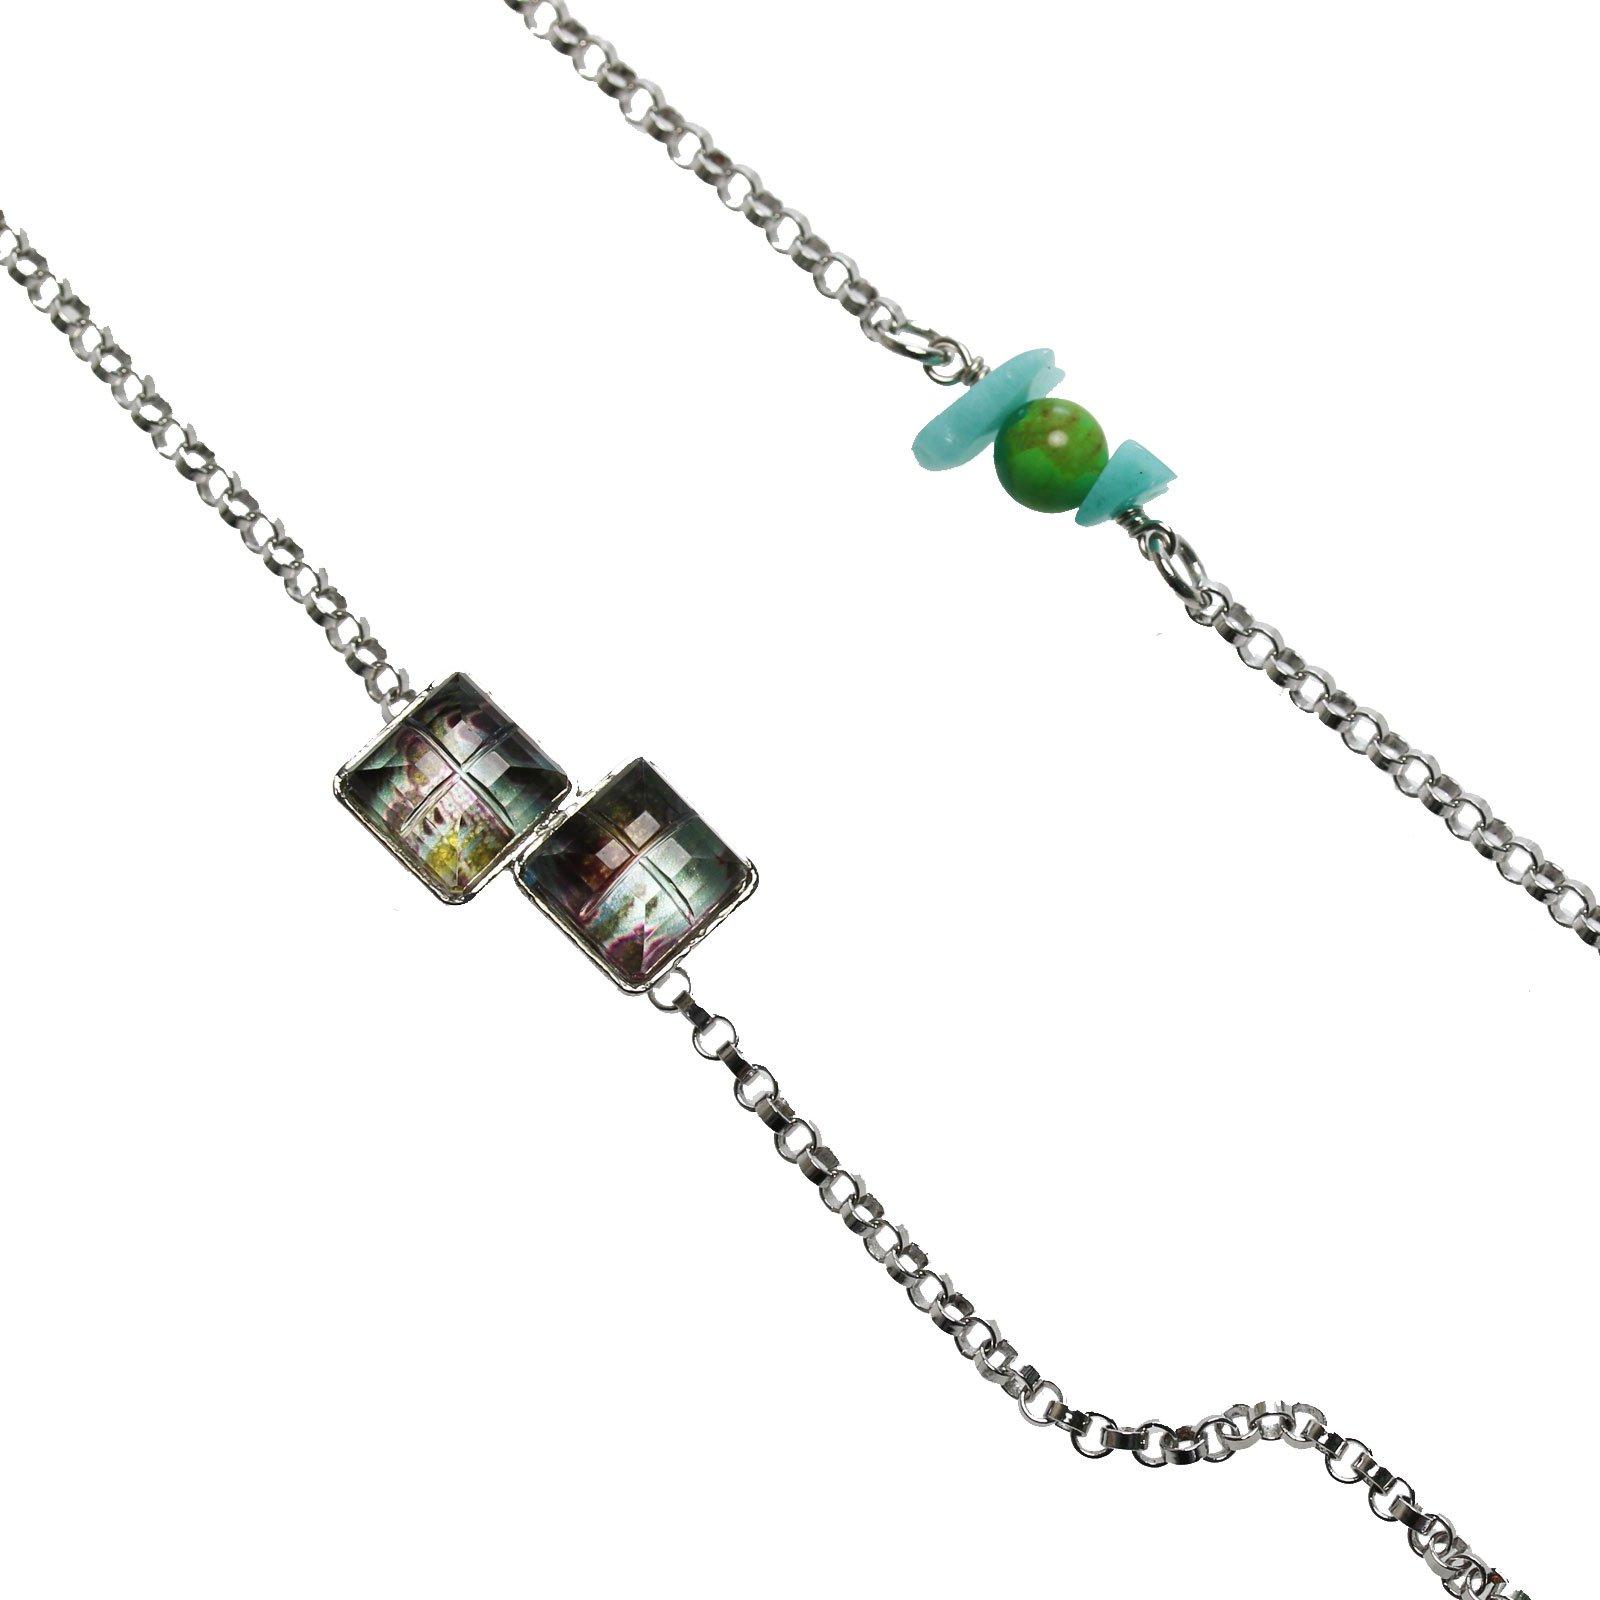 Tamarusan Eyeglasses Chain Turquoise Amazonite Unisex Handmade